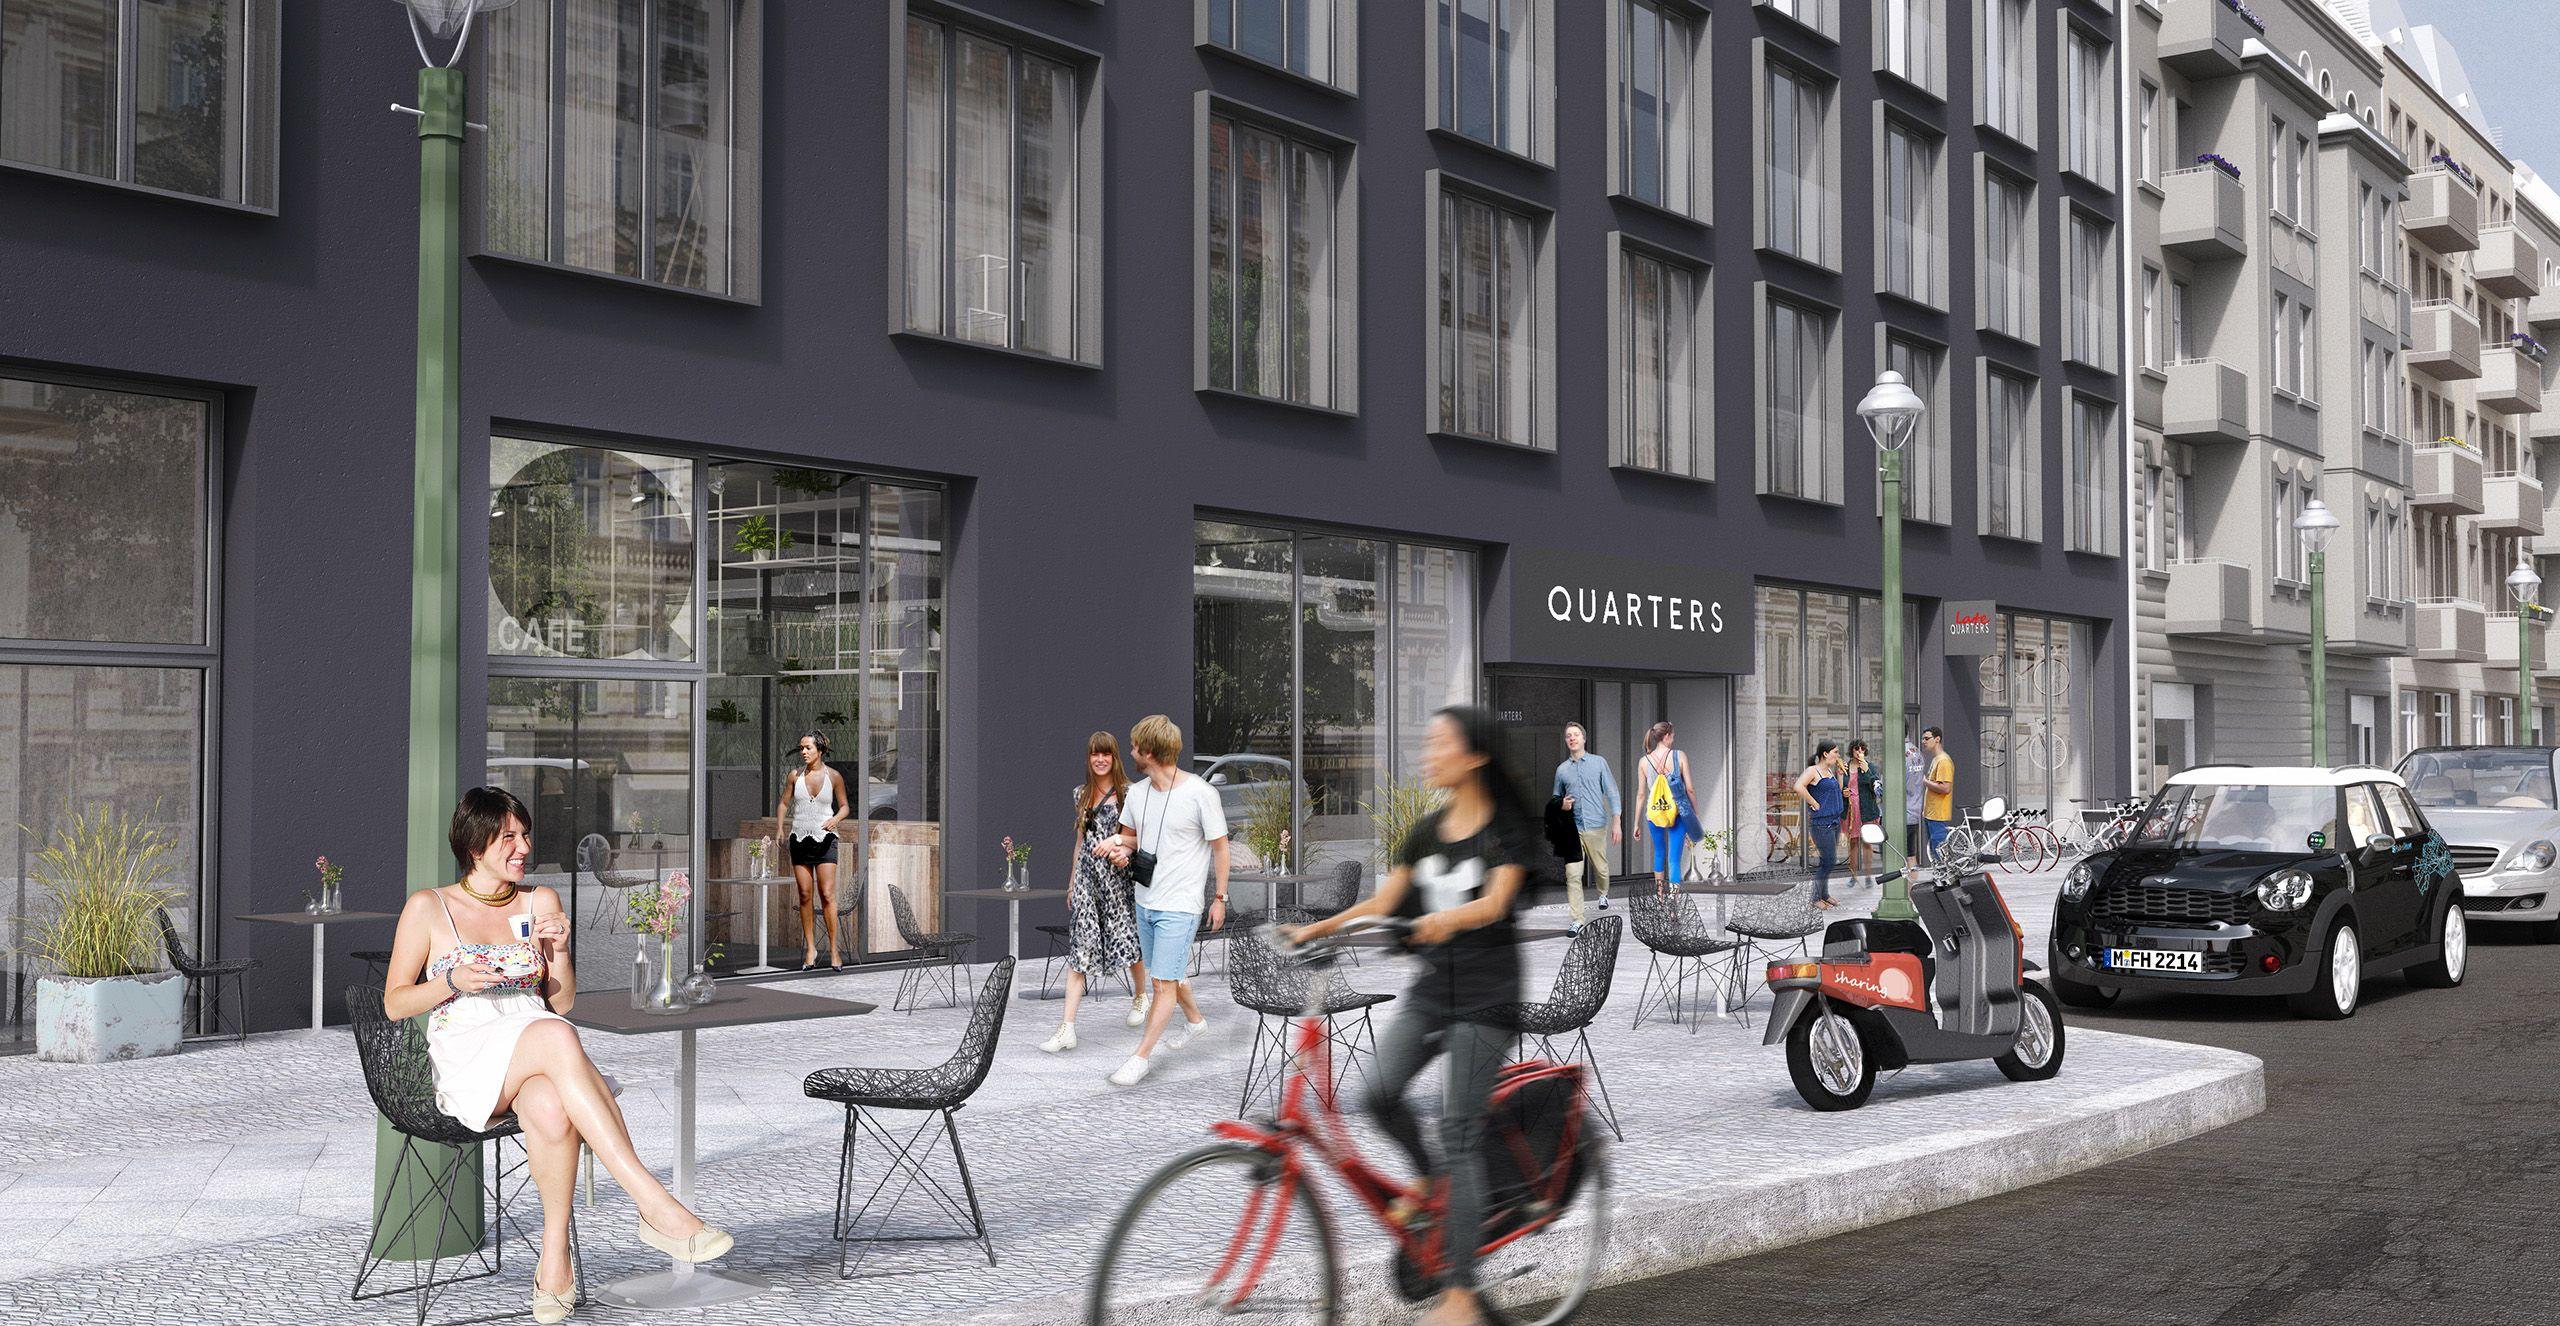 Architekturvisualisierung Berlin berlin mitte city quaters shared living render manufaktur